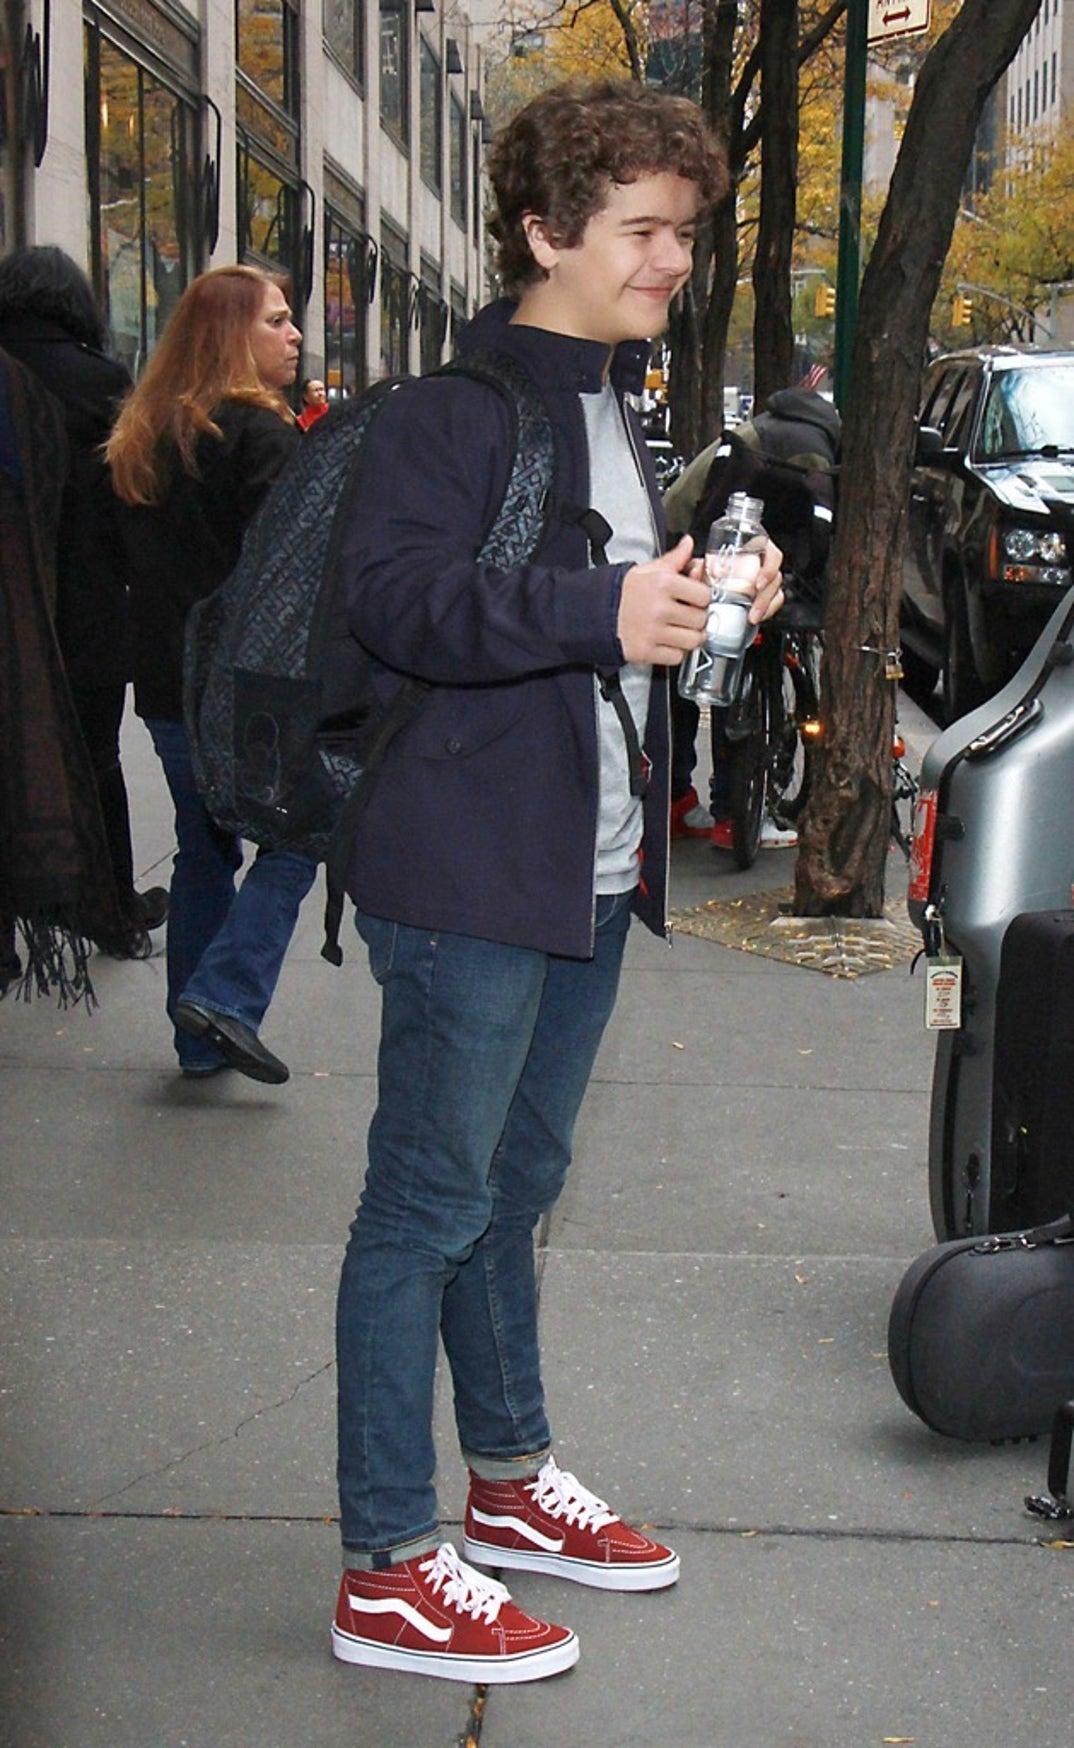 Kylie Jenner Wearing Vans Kylie Jenner Instagram